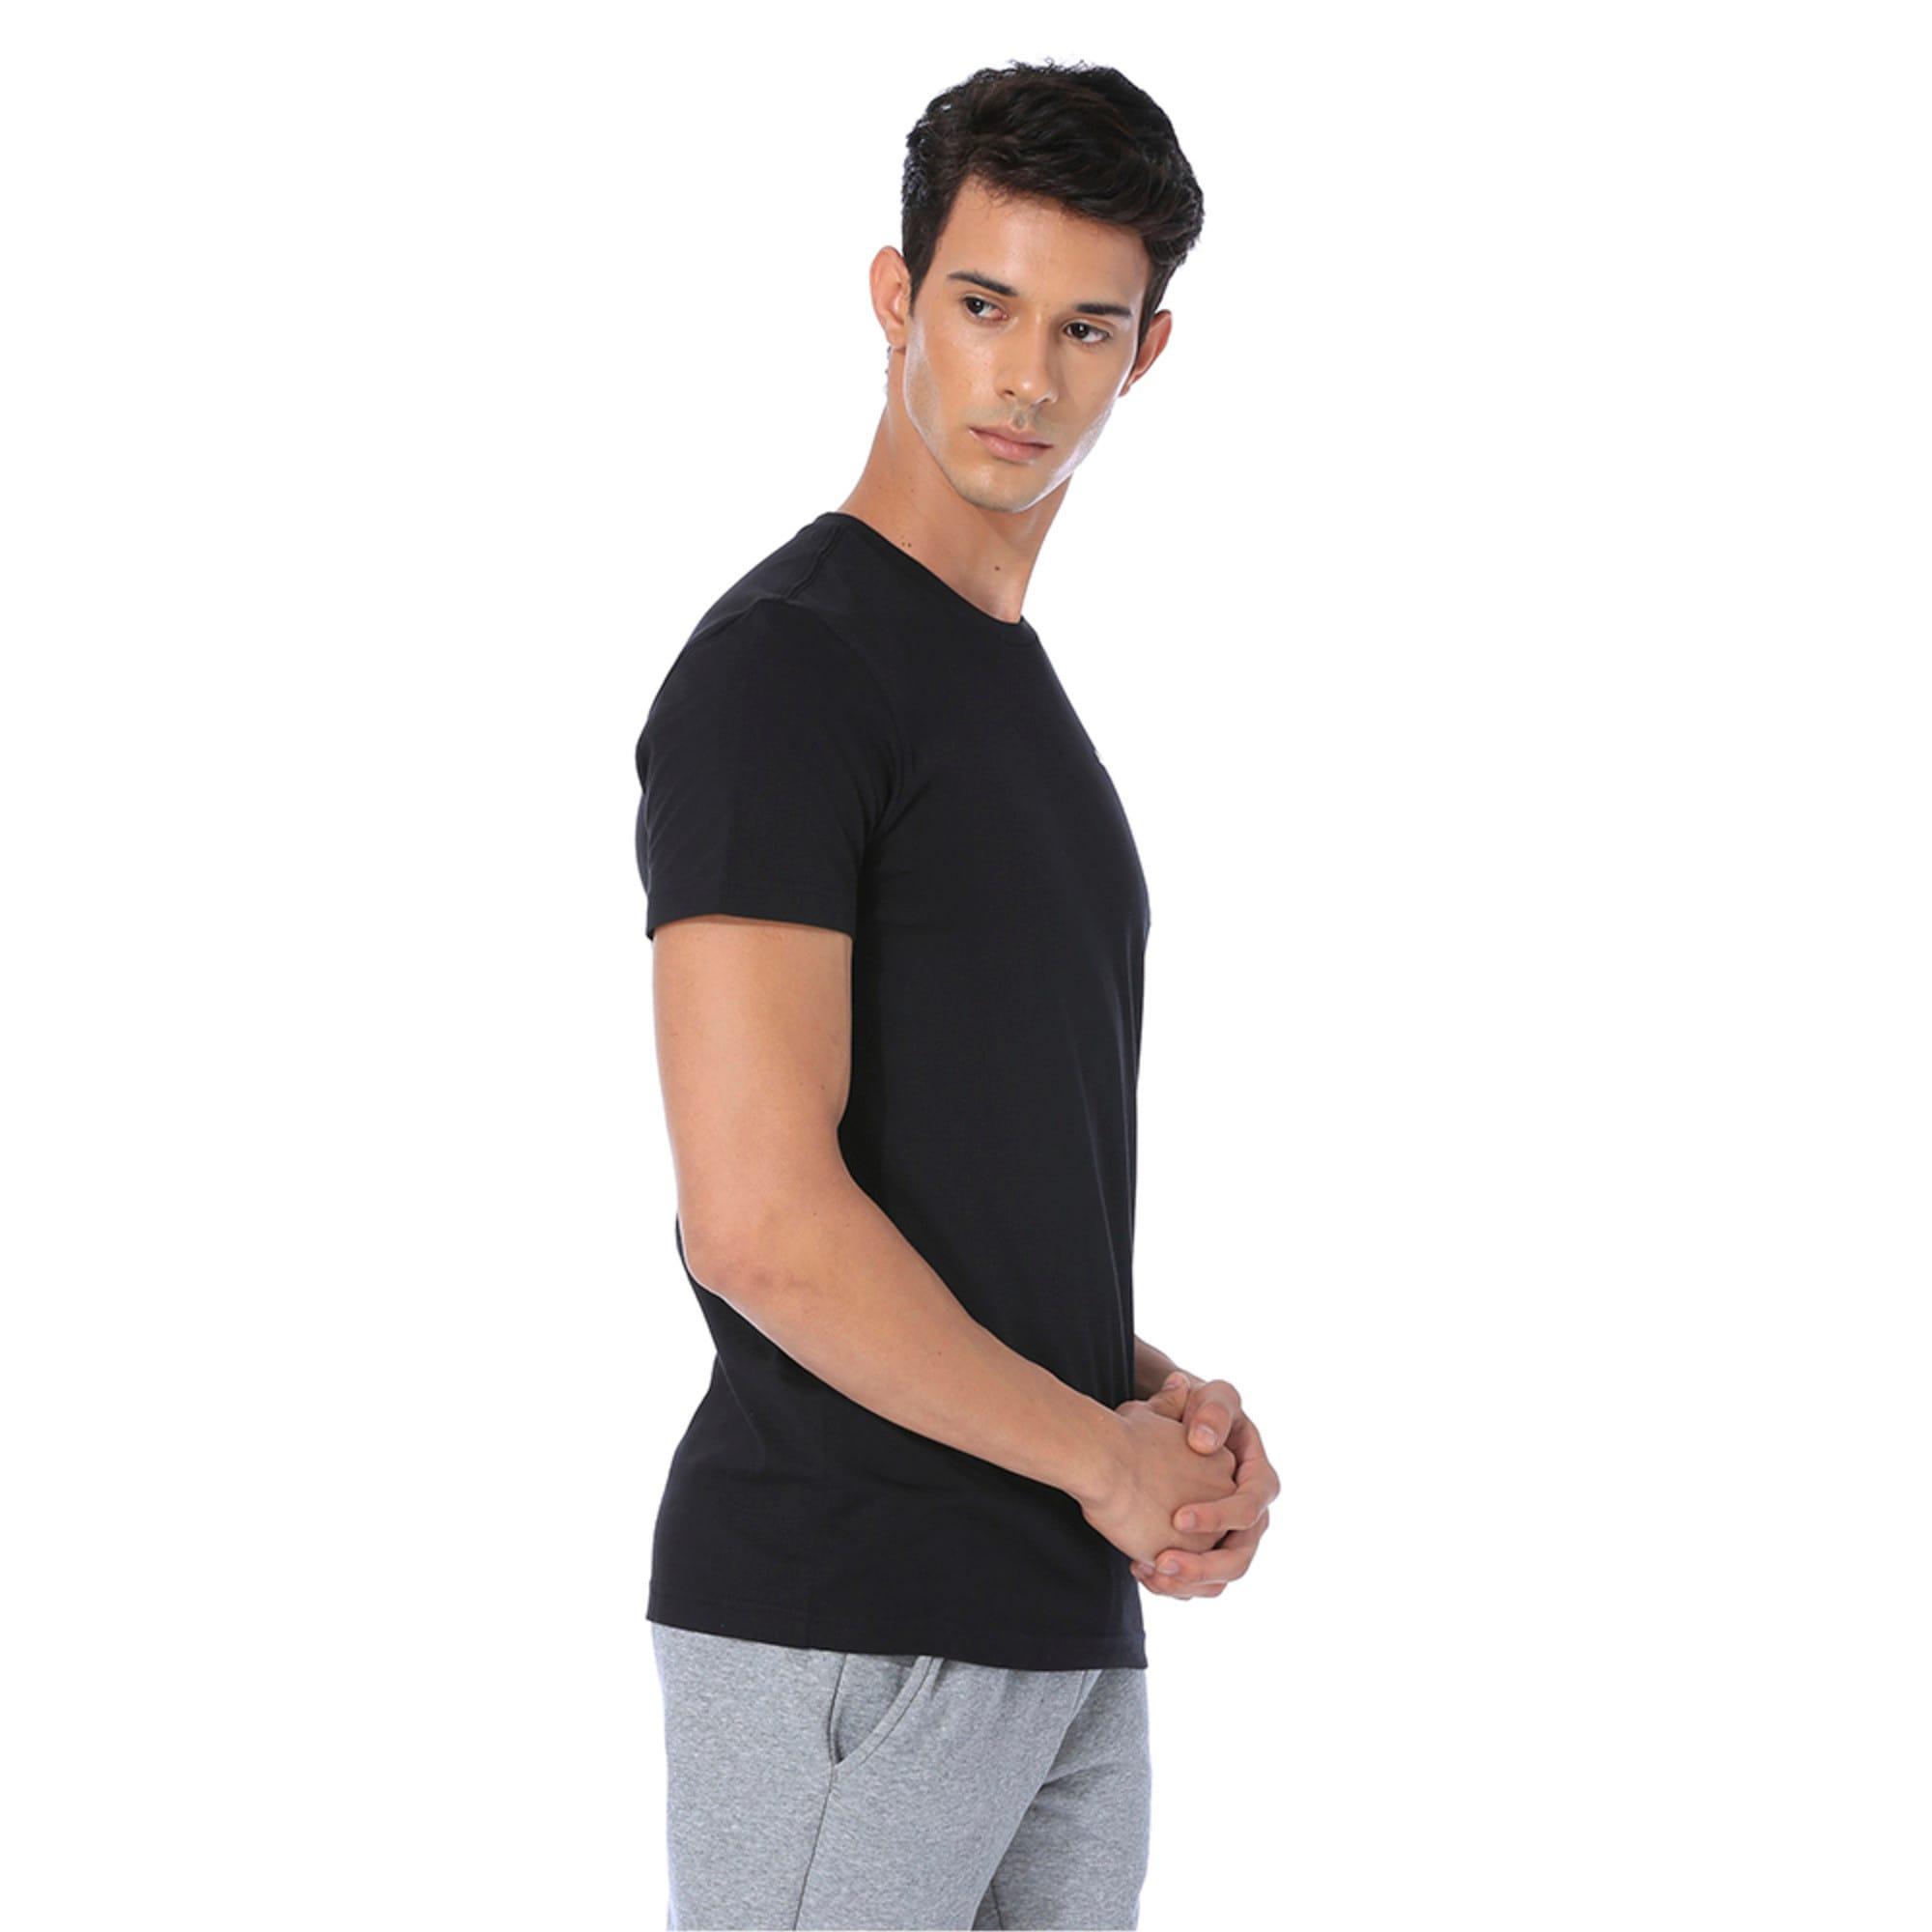 Thumbnail 2 of Men's Essentials Small Logo T-Shirt, Cotton Black, medium-IND